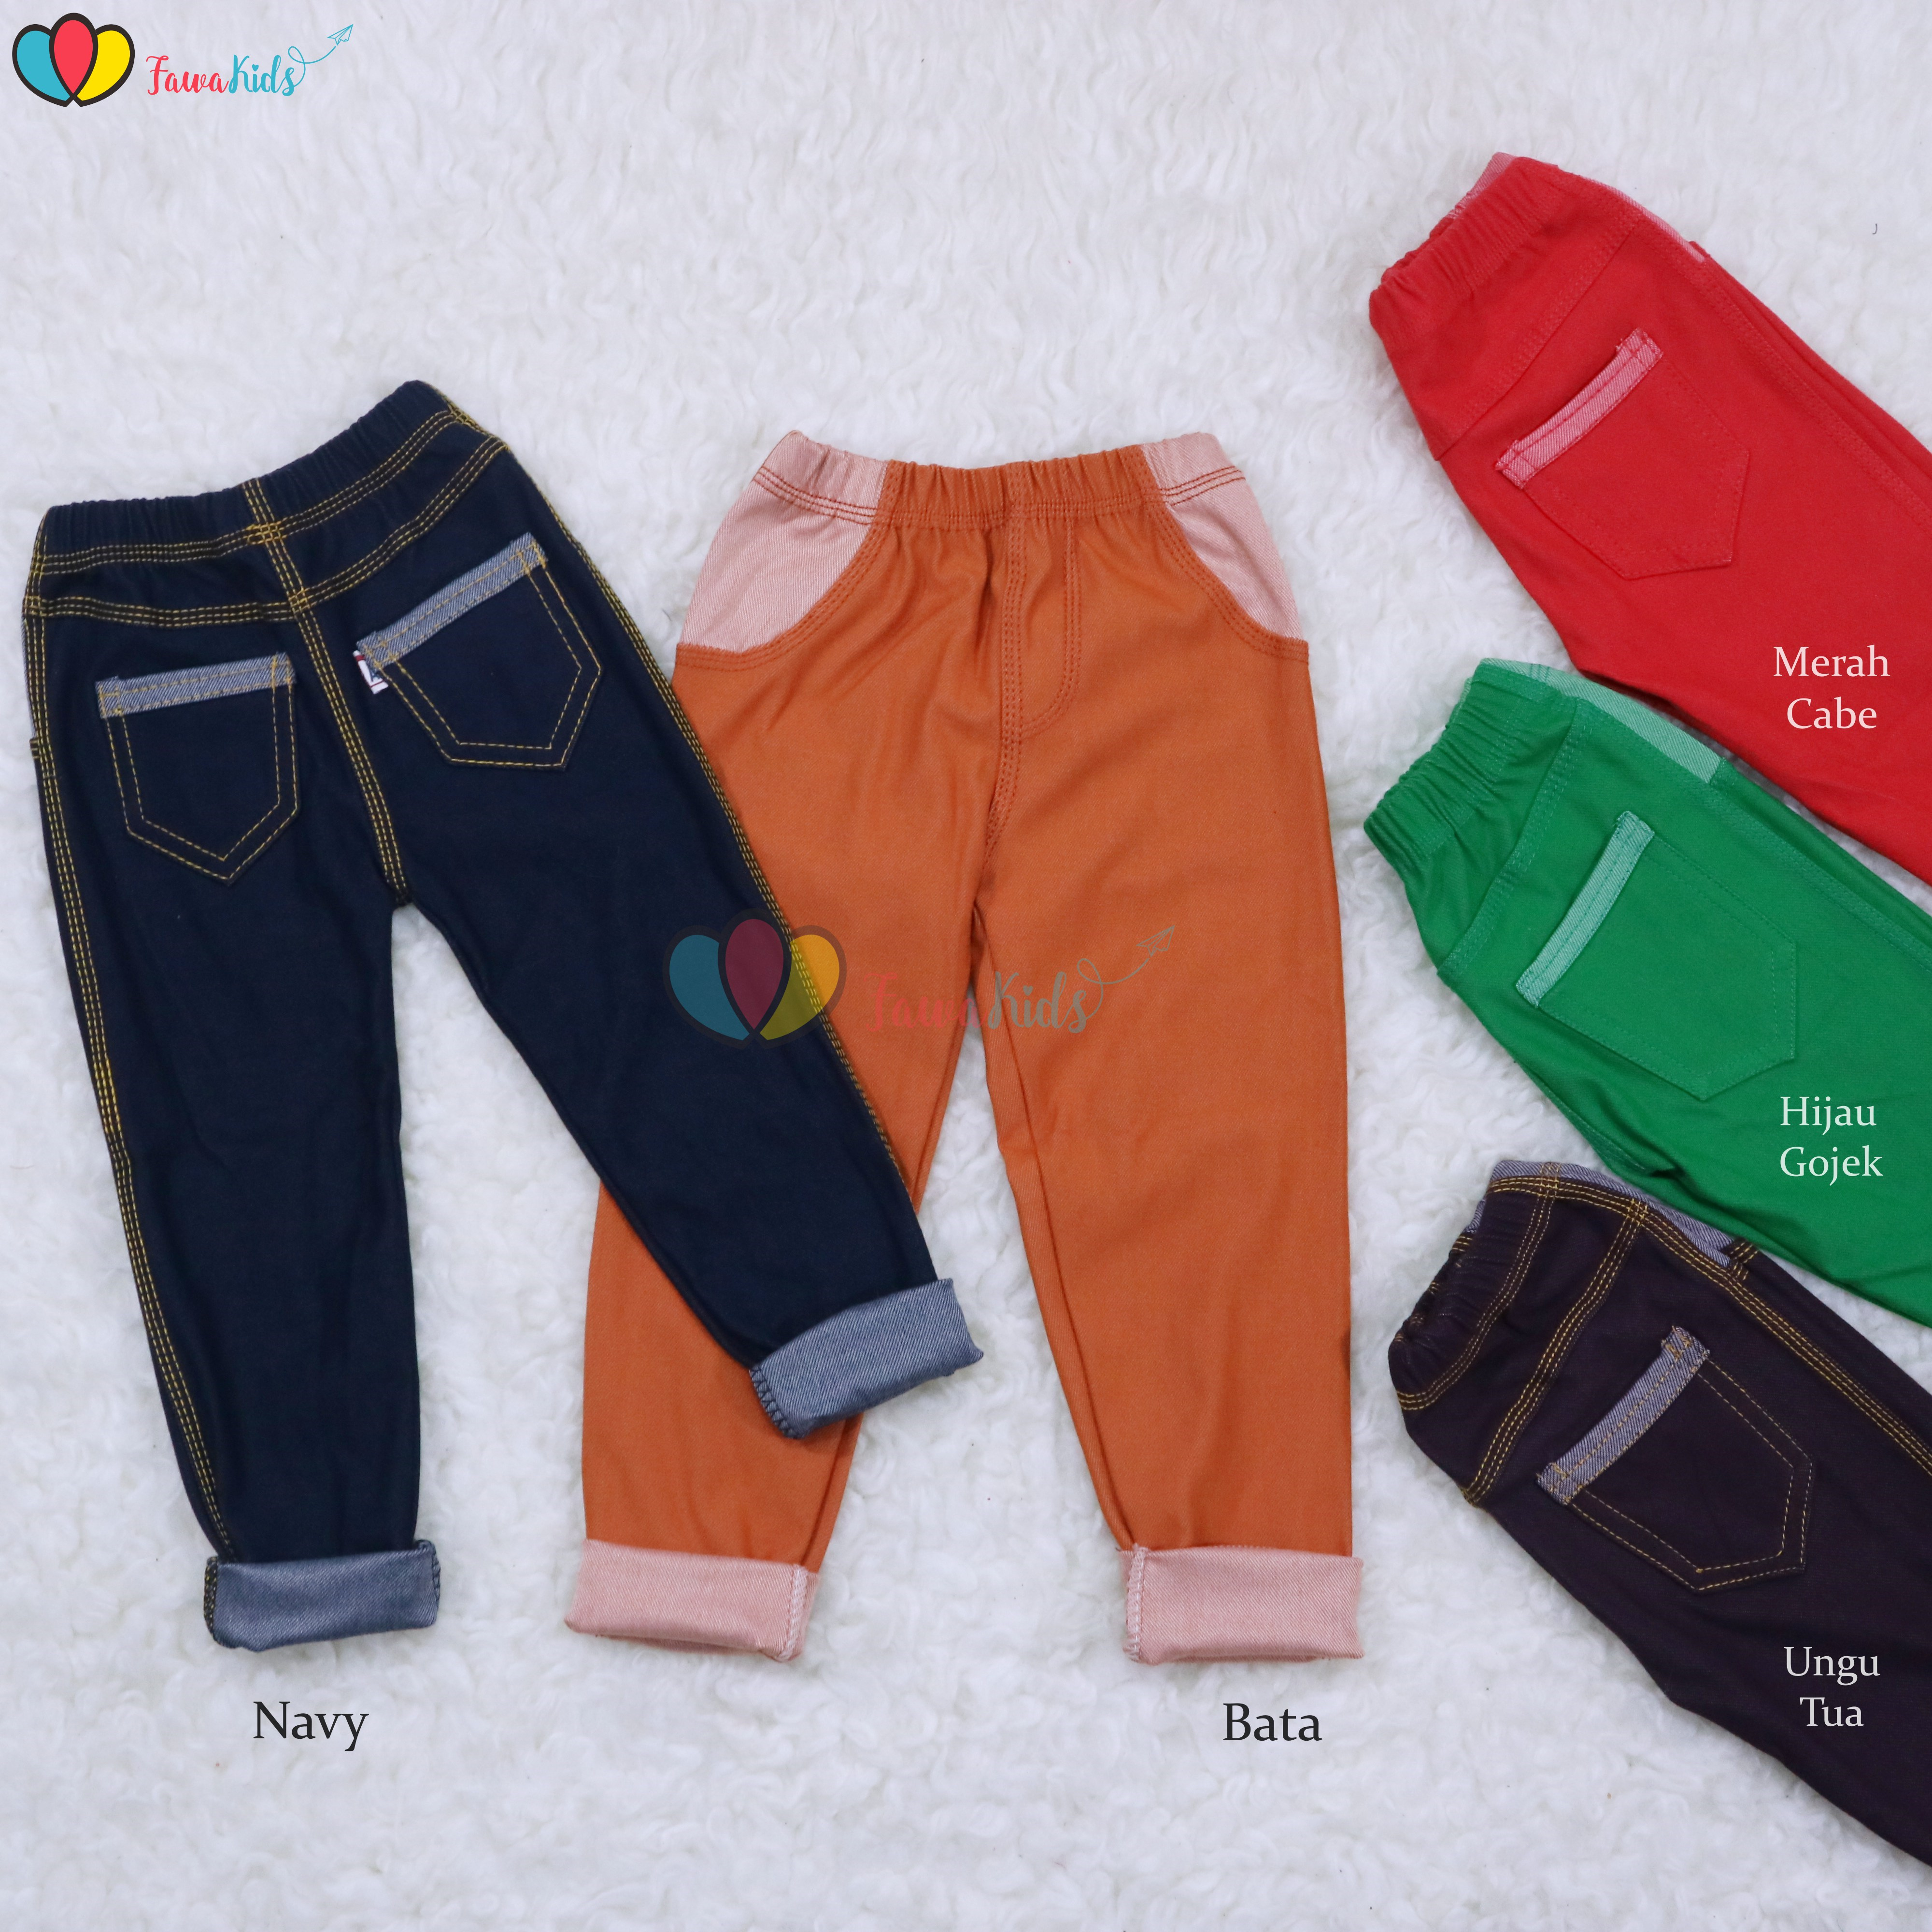 Jeans Legging Kantong Anak Uk Bayi Remaja Laki Perempuan Celana Panjang Anak Polos Denim Legging Kios Balita Fawa Lazada Indonesia